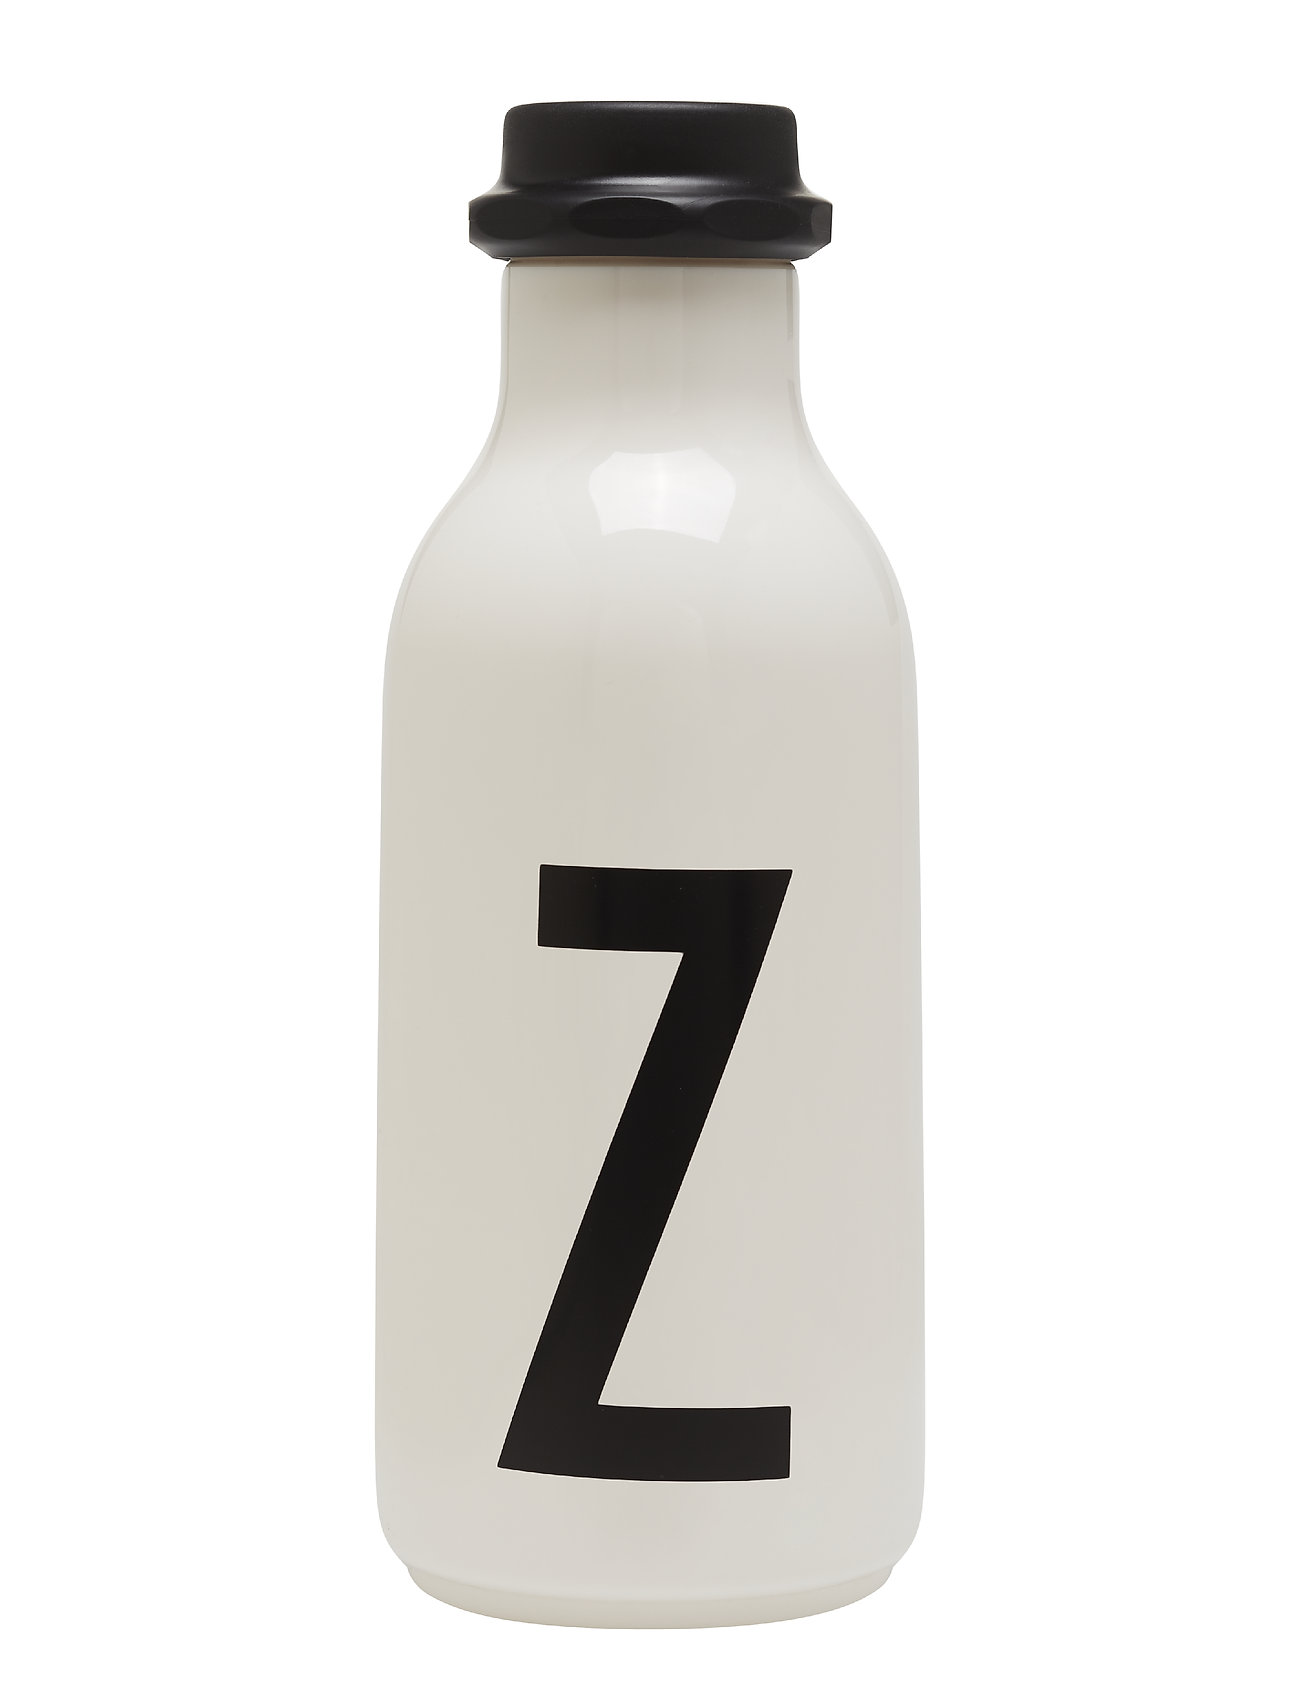 Water zwhiteDesign Letters A Bottle A zwhiteDesign Bottle Water rdexBCo